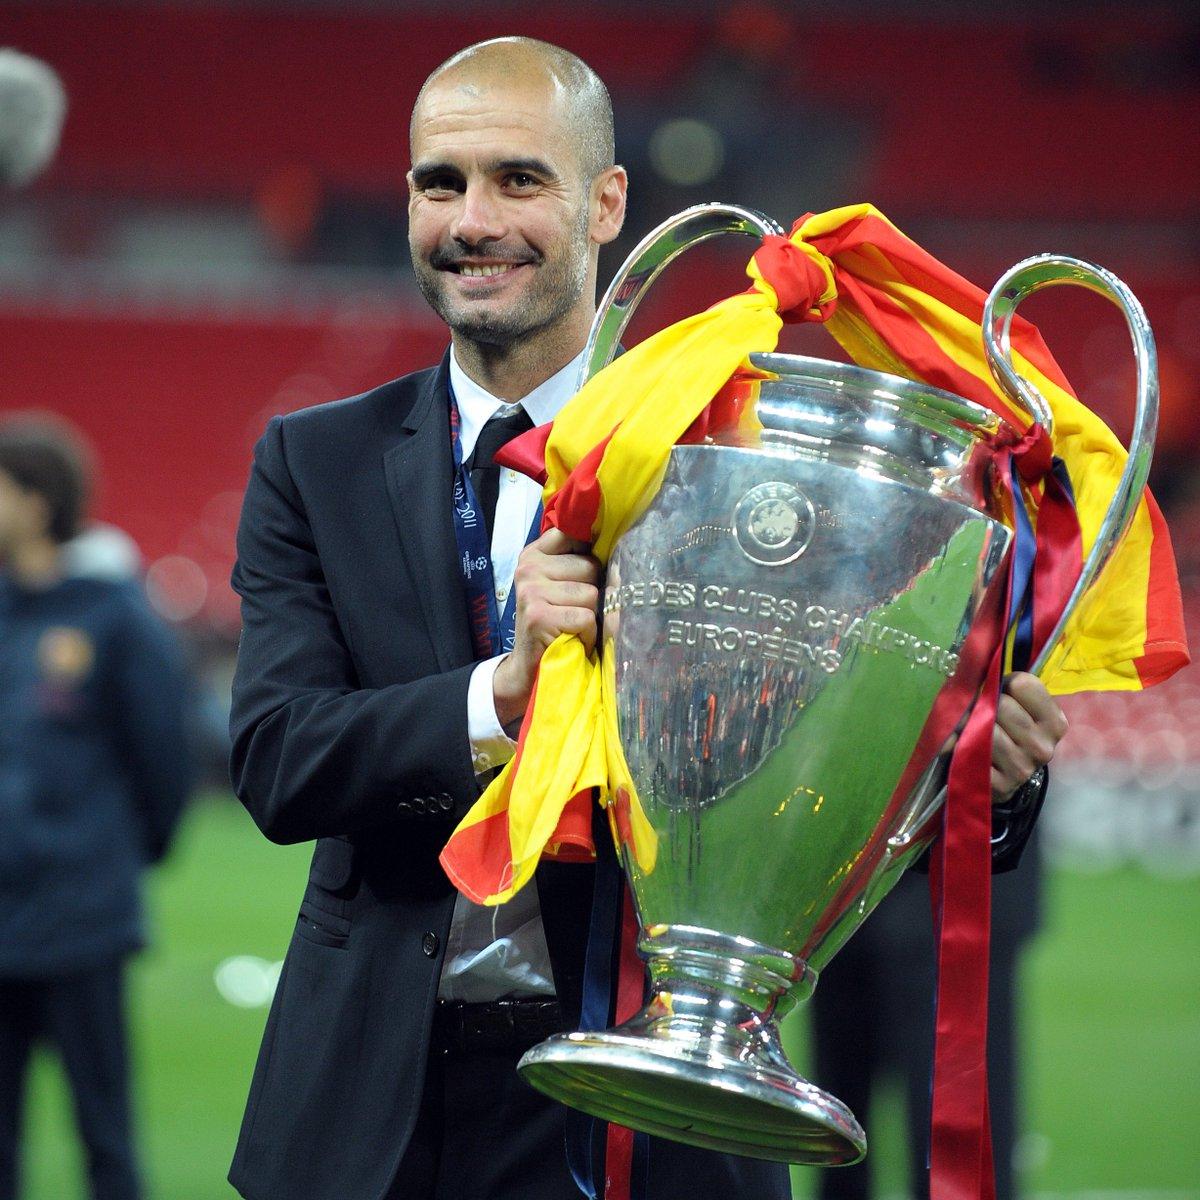 10 years since Josep Guardiola last reached the Champions League final as a coach...  2⃣0⃣0⃣9⃣🏆 2⃣0⃣1⃣1⃣🏆 2⃣0⃣2⃣1⃣❓  #UCL https://t.co/qiVgPfWCC5